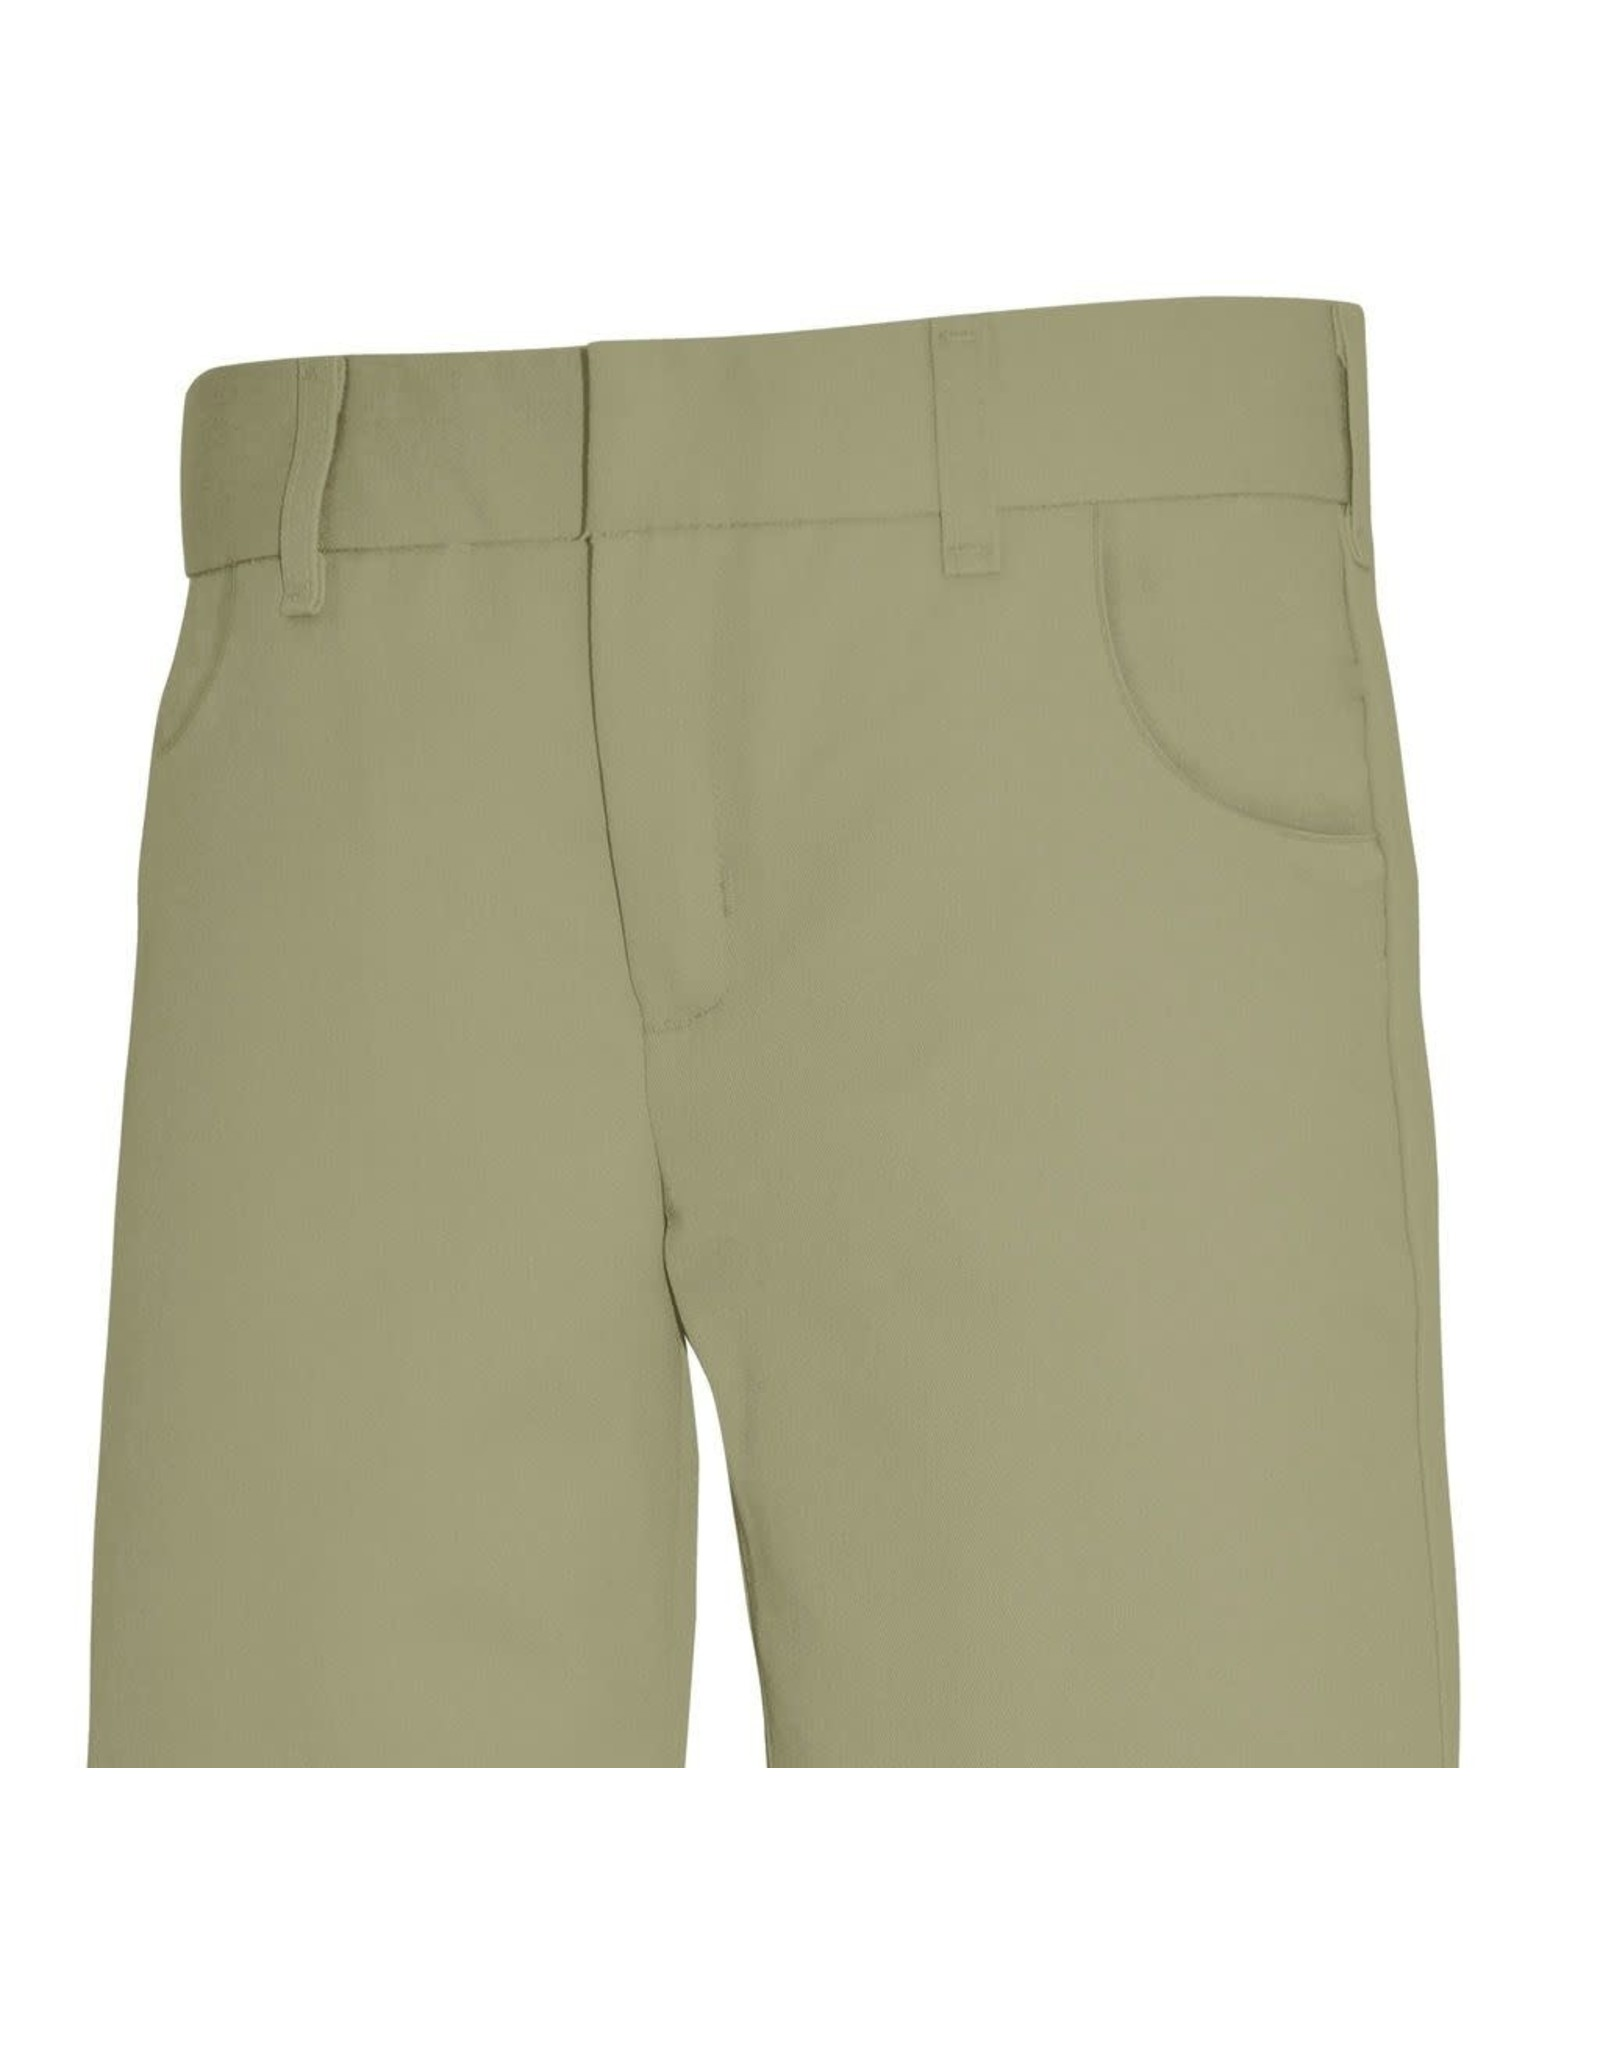 UNIFORM Sale-JD Girls Shorts -OLD STYLE-Final Sale